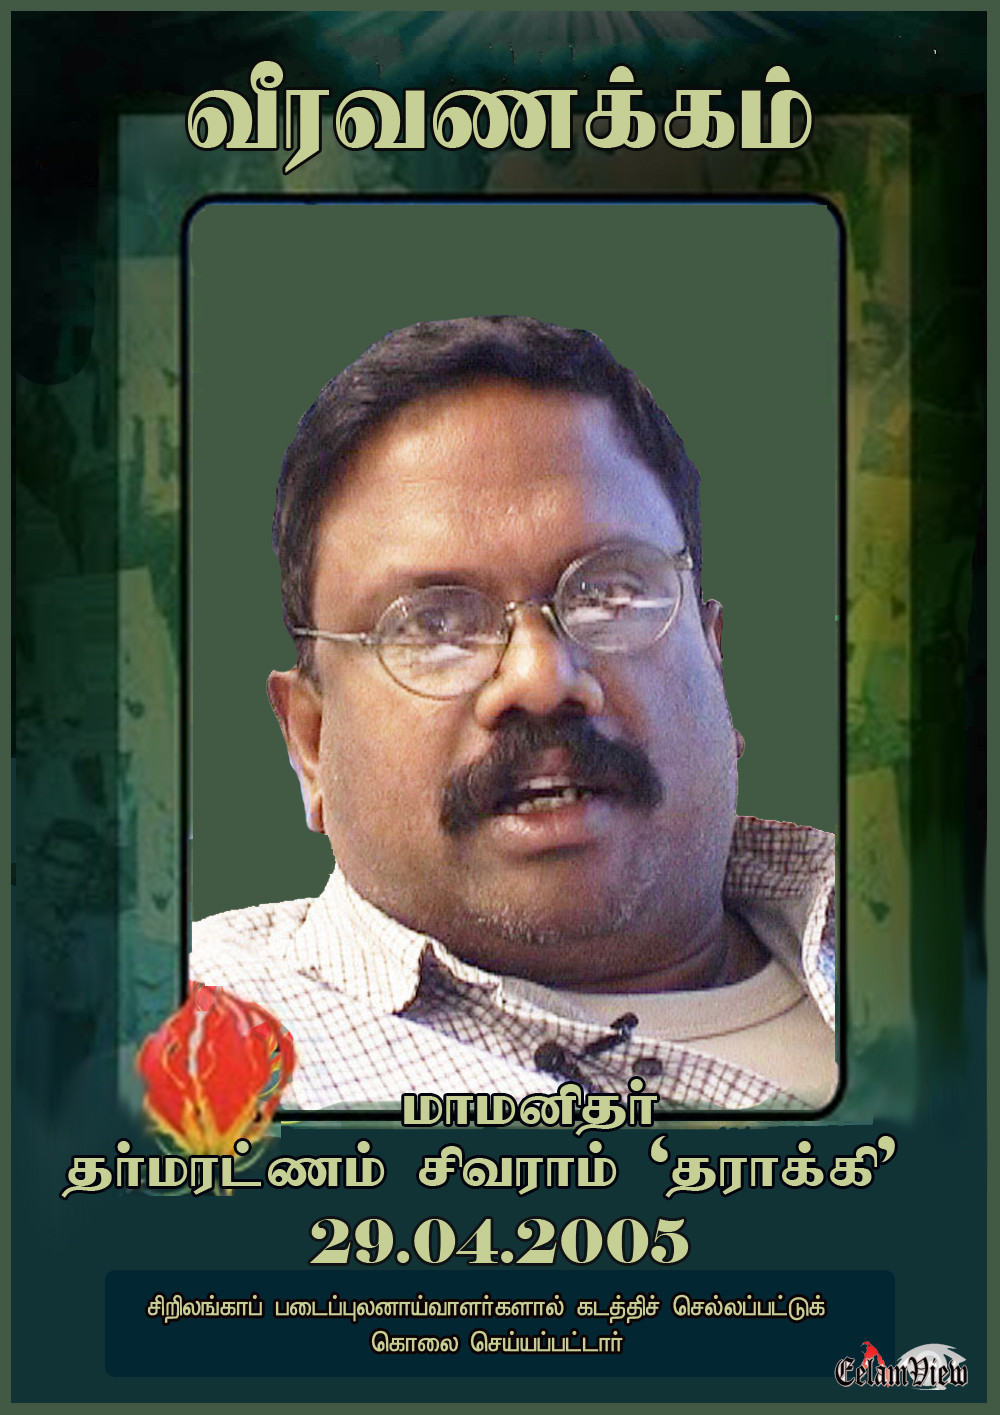 Prabhakran_4